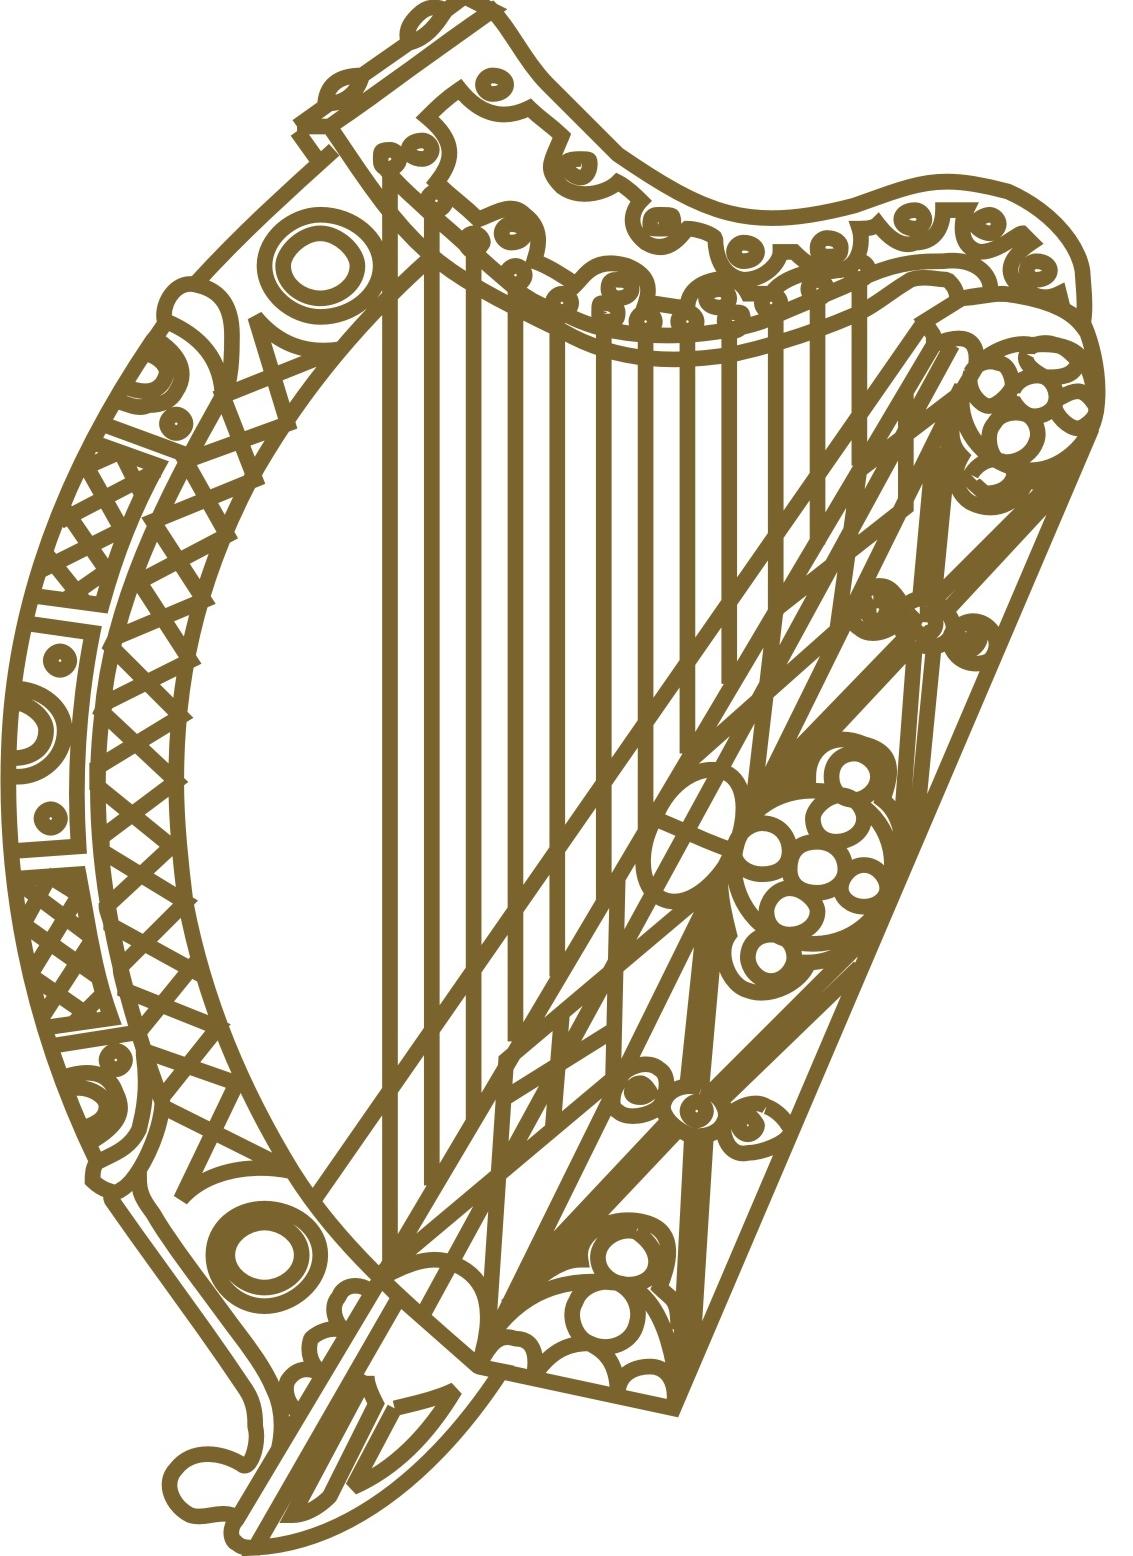 Harp clipart irish harp Transparent Pictures ClipartBarn art harp